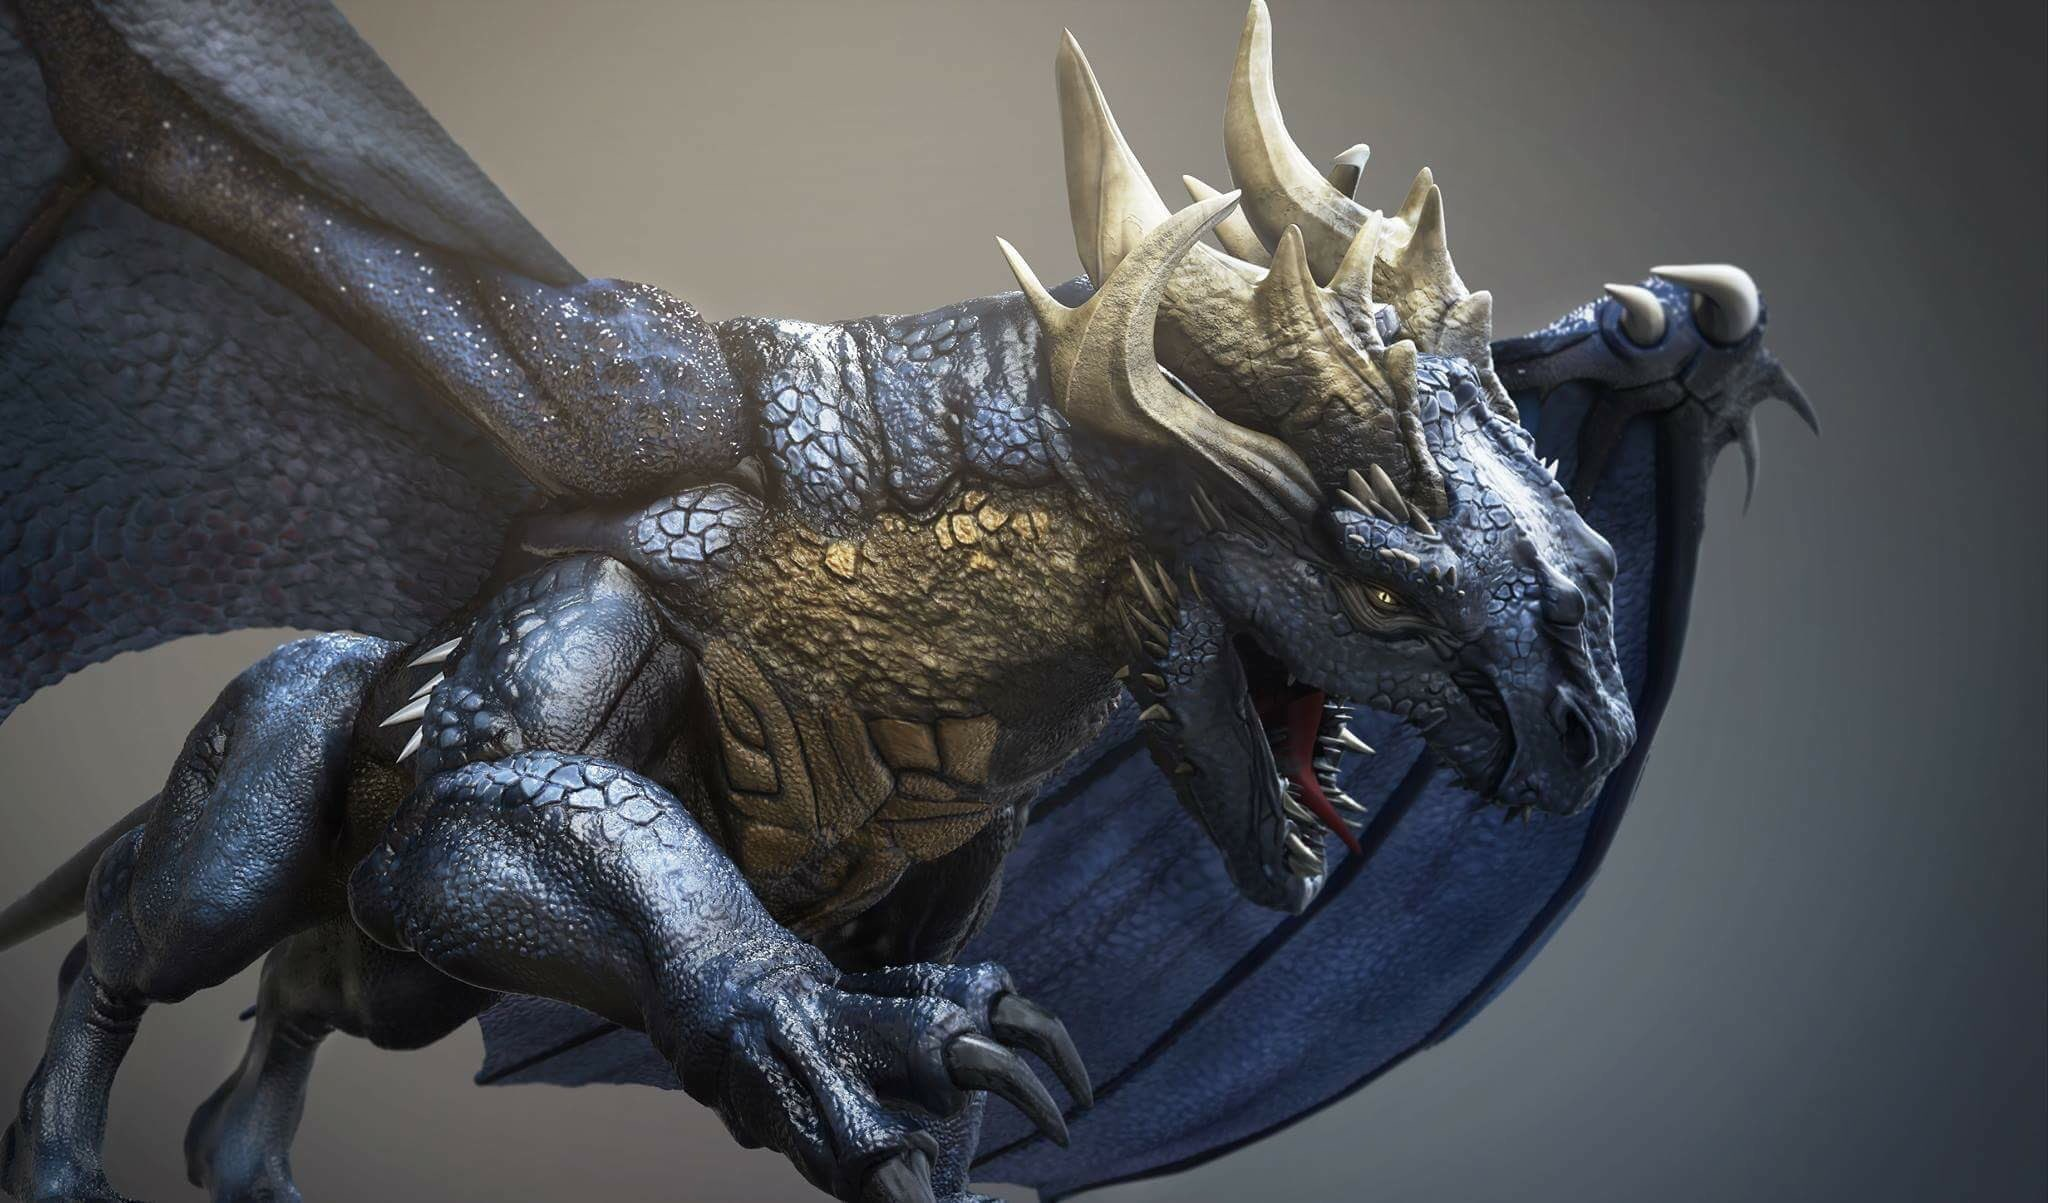 ark_dragonpunk_art_002.JPG